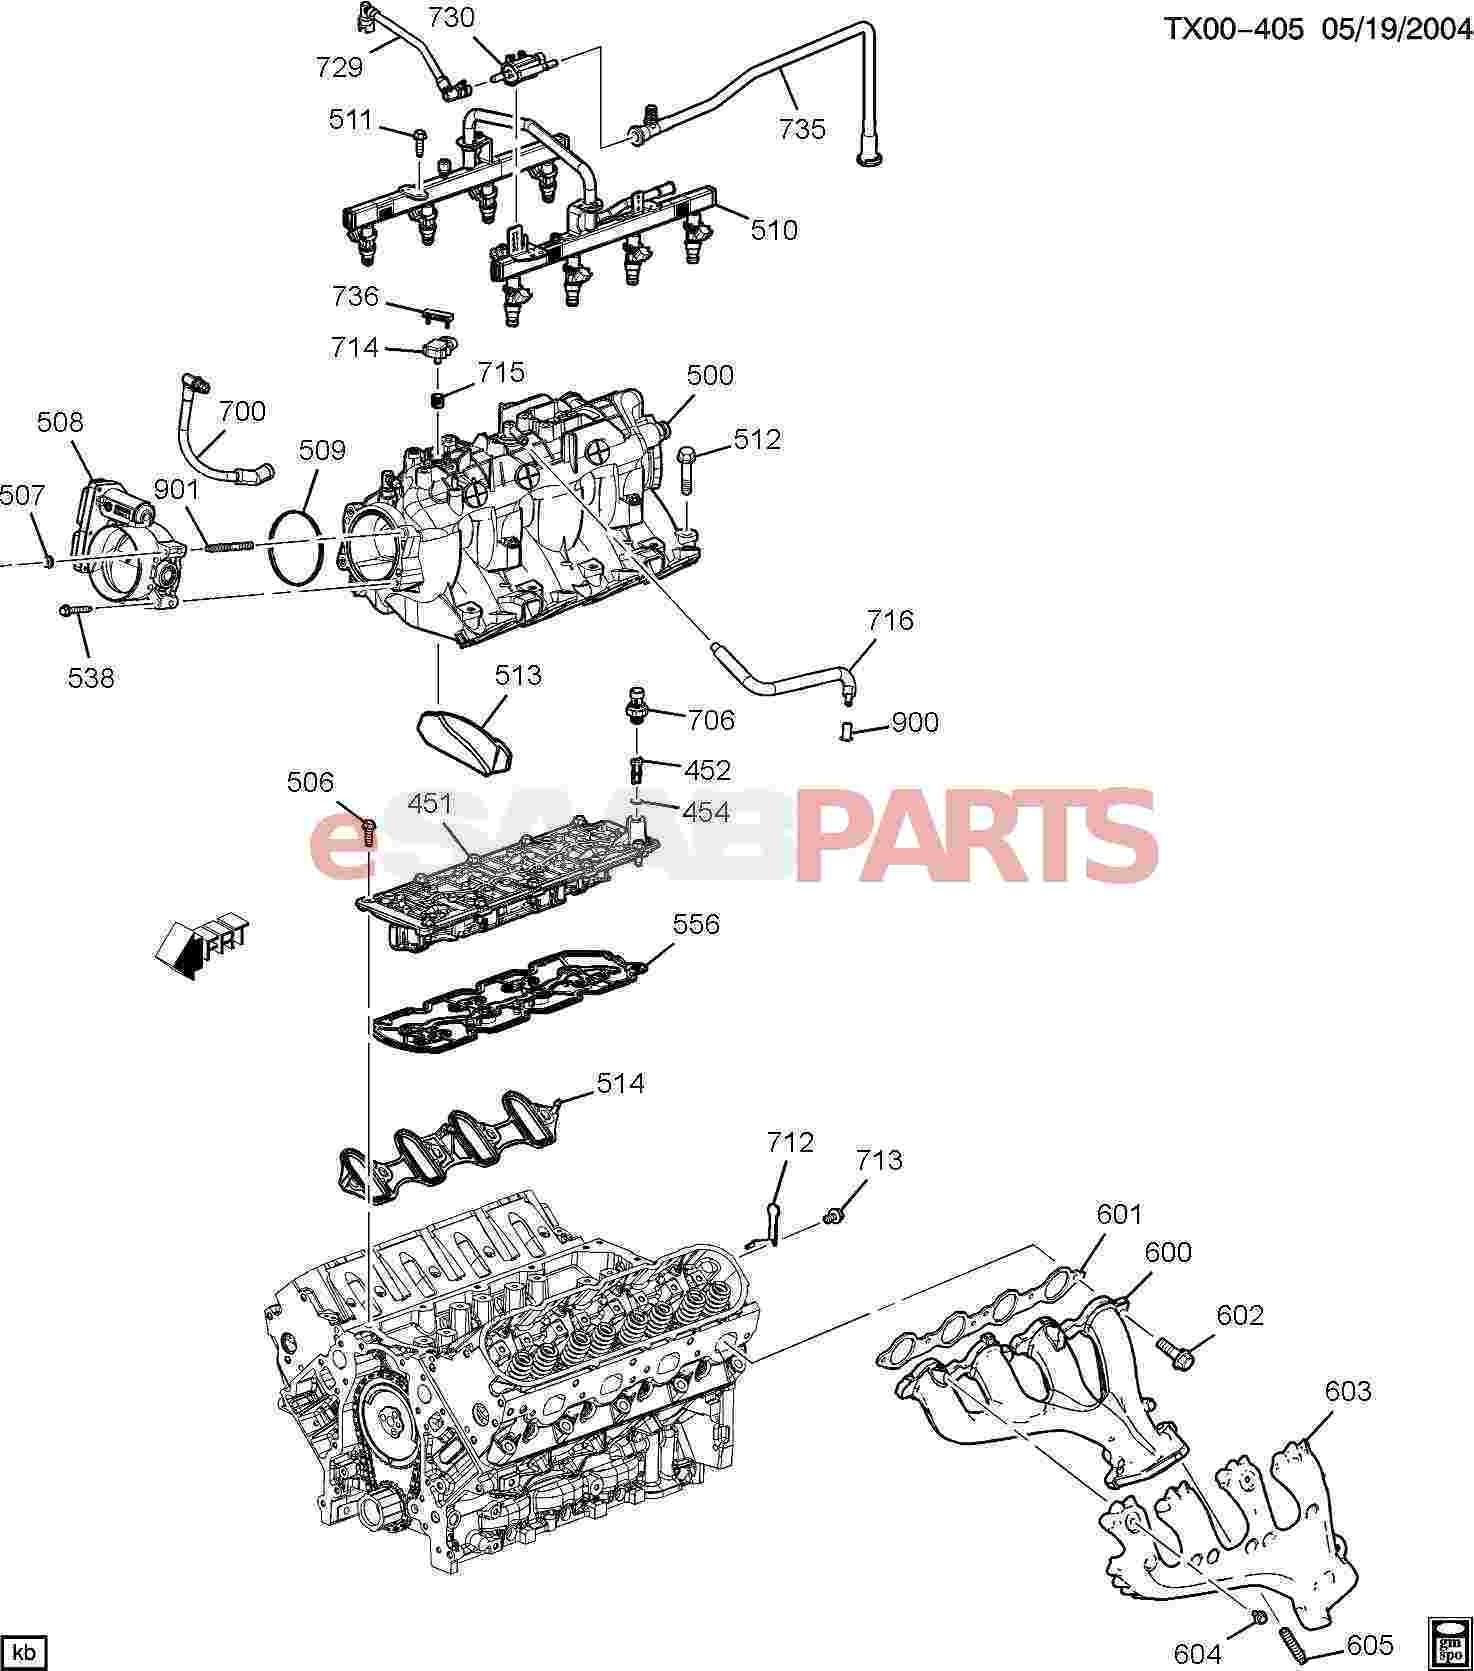 4 3 Vortec Engine Diagram 2 Esaabparts Saab 9 7x Engine Parts Engine Internal 5 3m Of 4 3 Vortec Engine Diagram 2